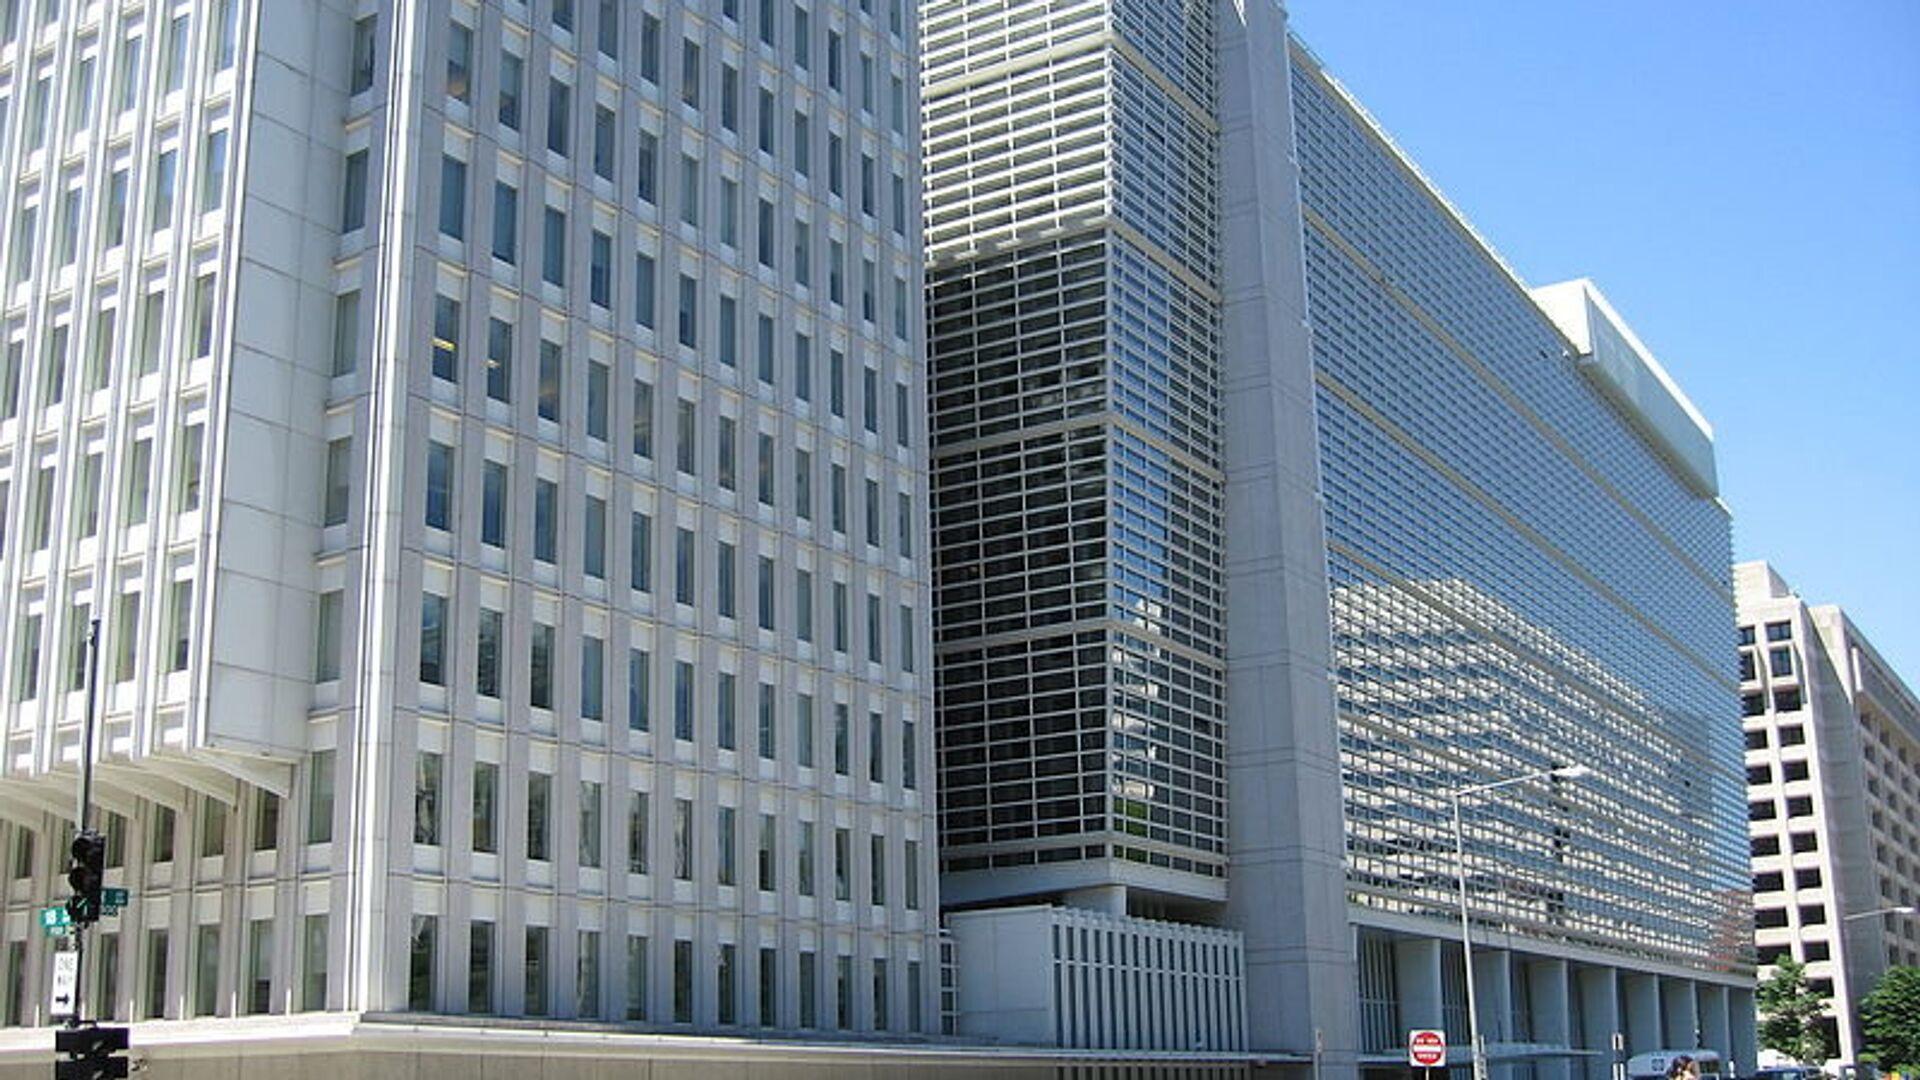 Штаб-квартира Всемирного банка в Вашингтоне - РИА Новости, 1920, 08.06.2021